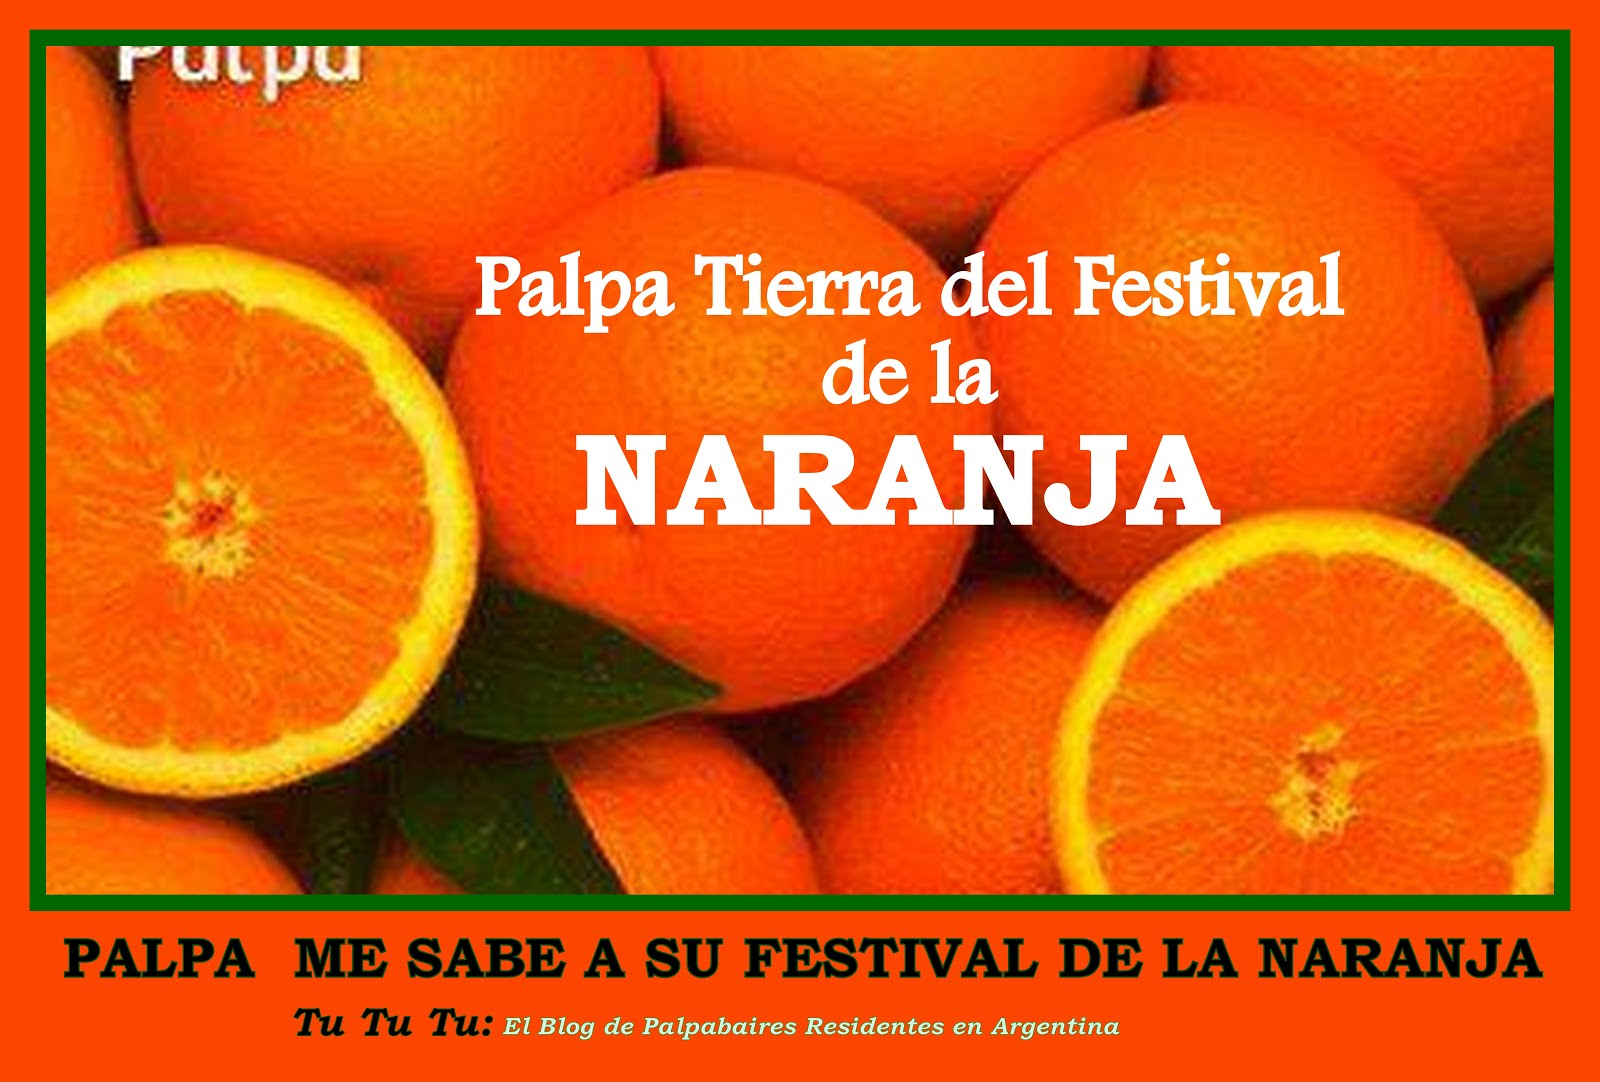 Palpa Tierra del Festival de la NARANJA